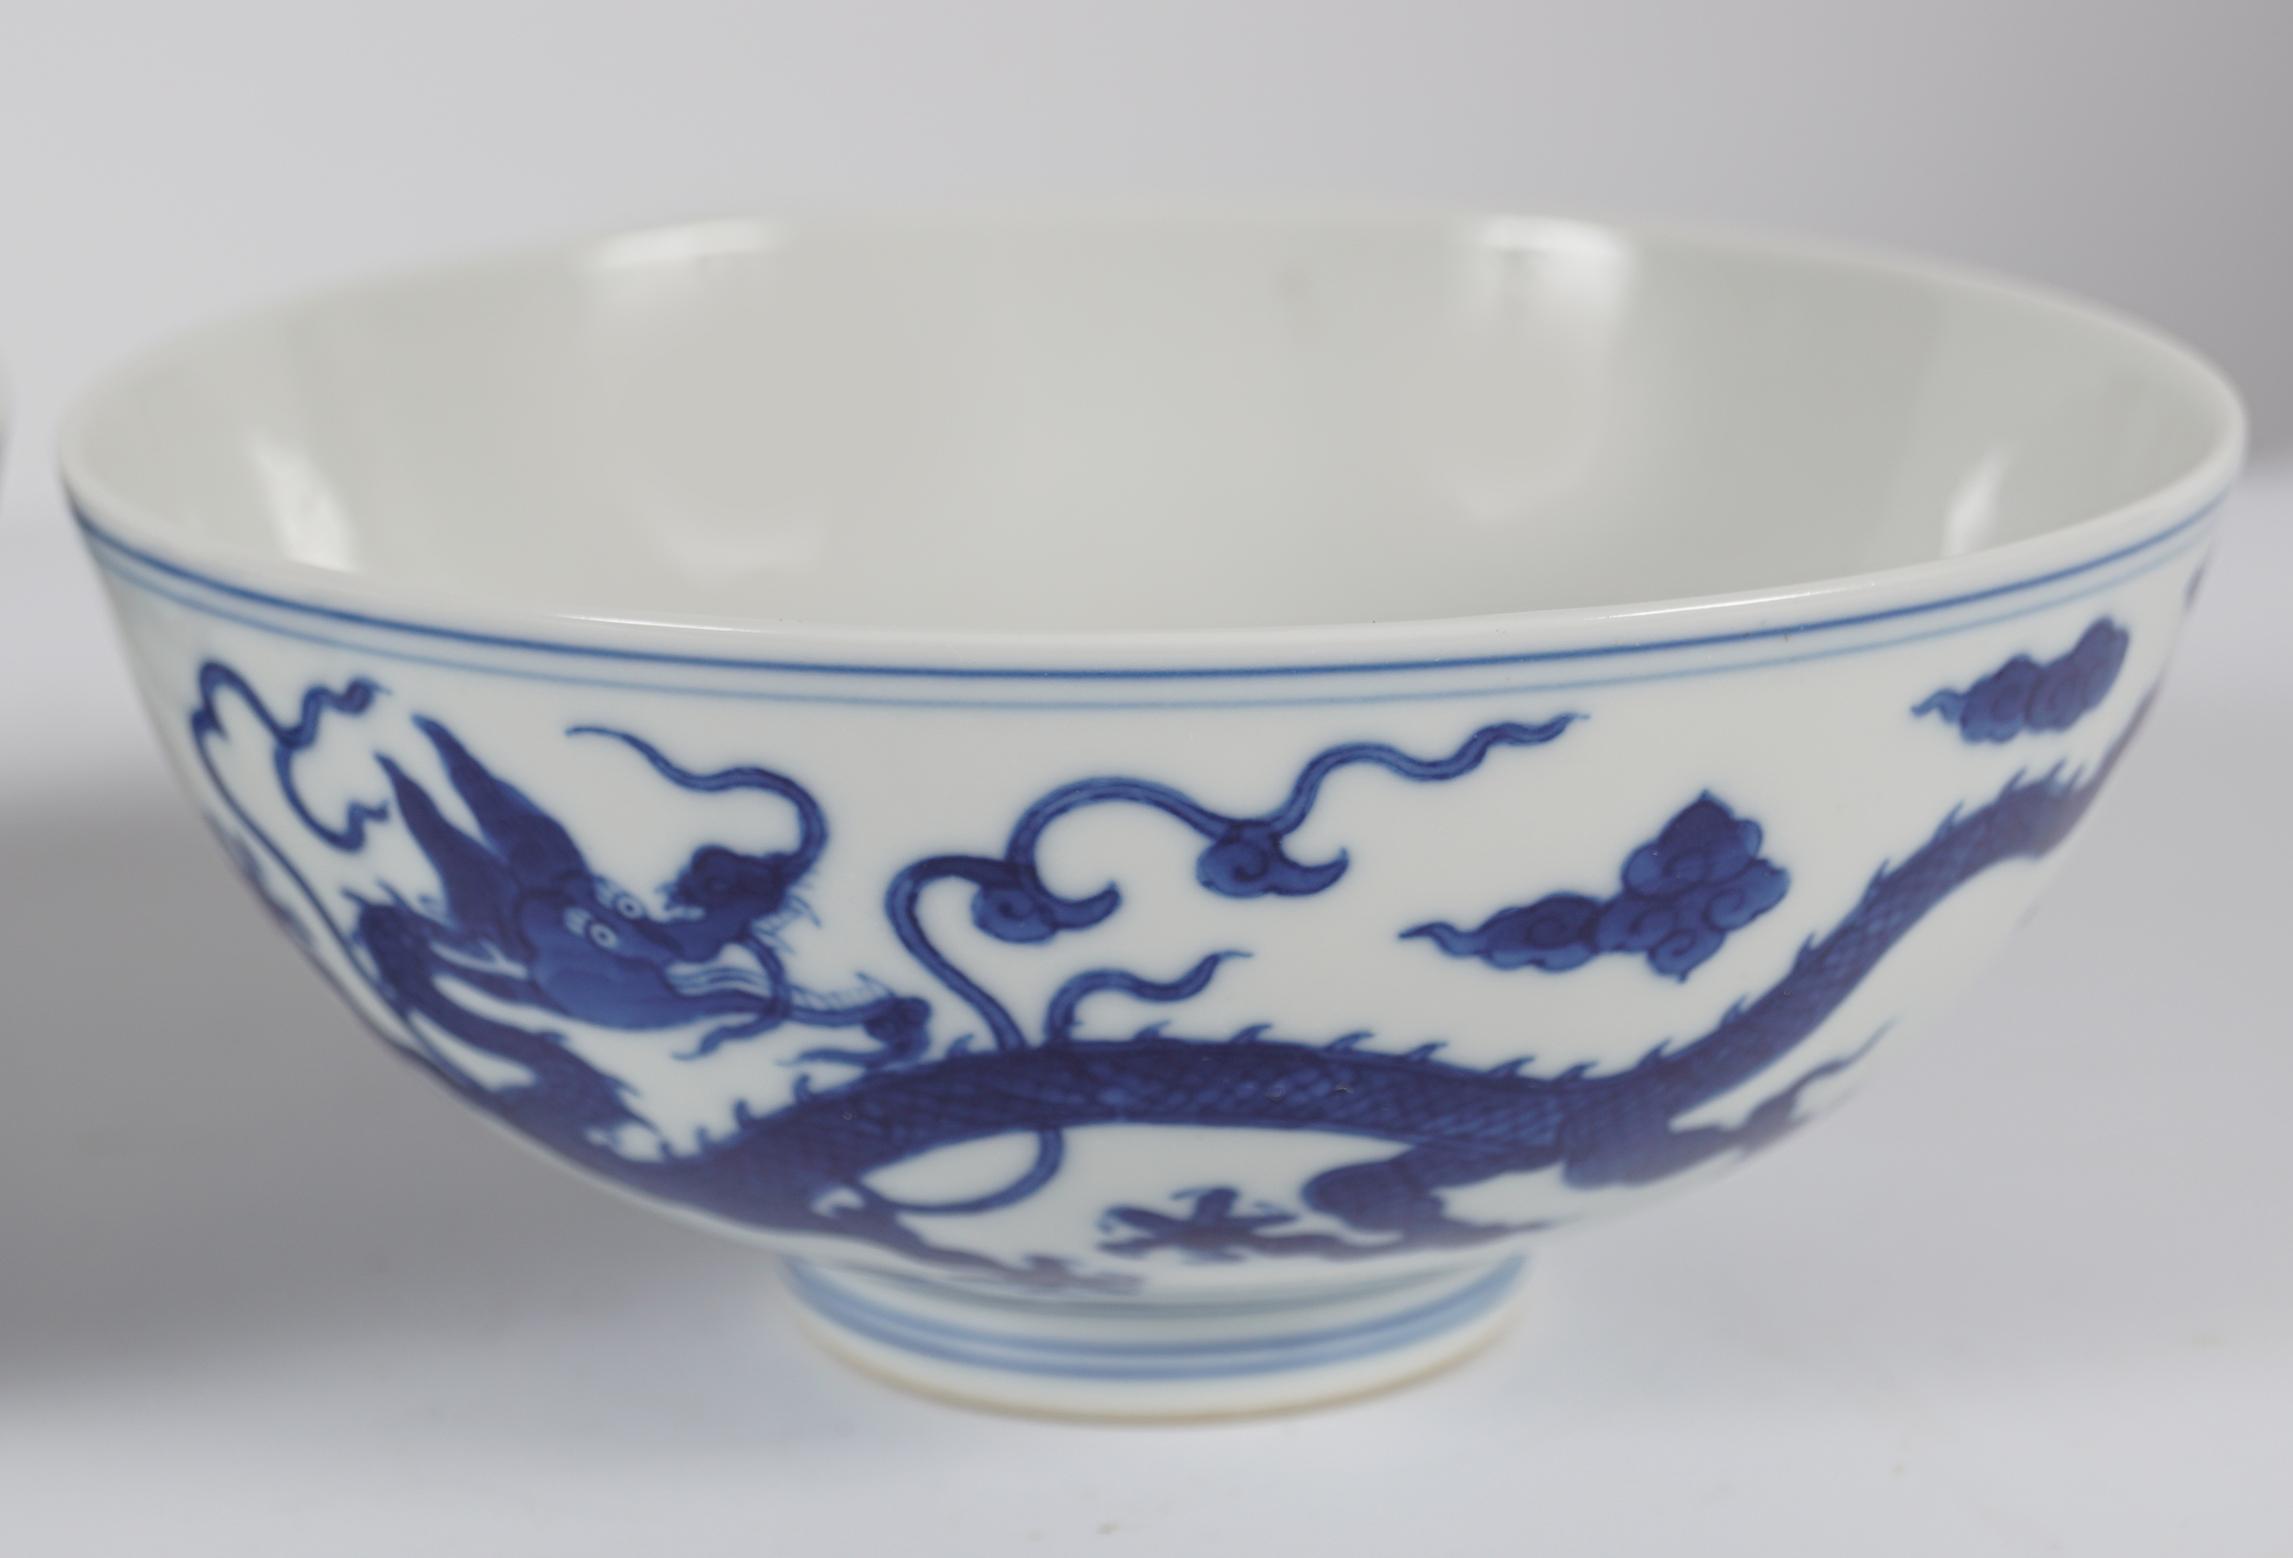 PAIR OF CHINESE DRAGON BOWLS - Image 3 of 6